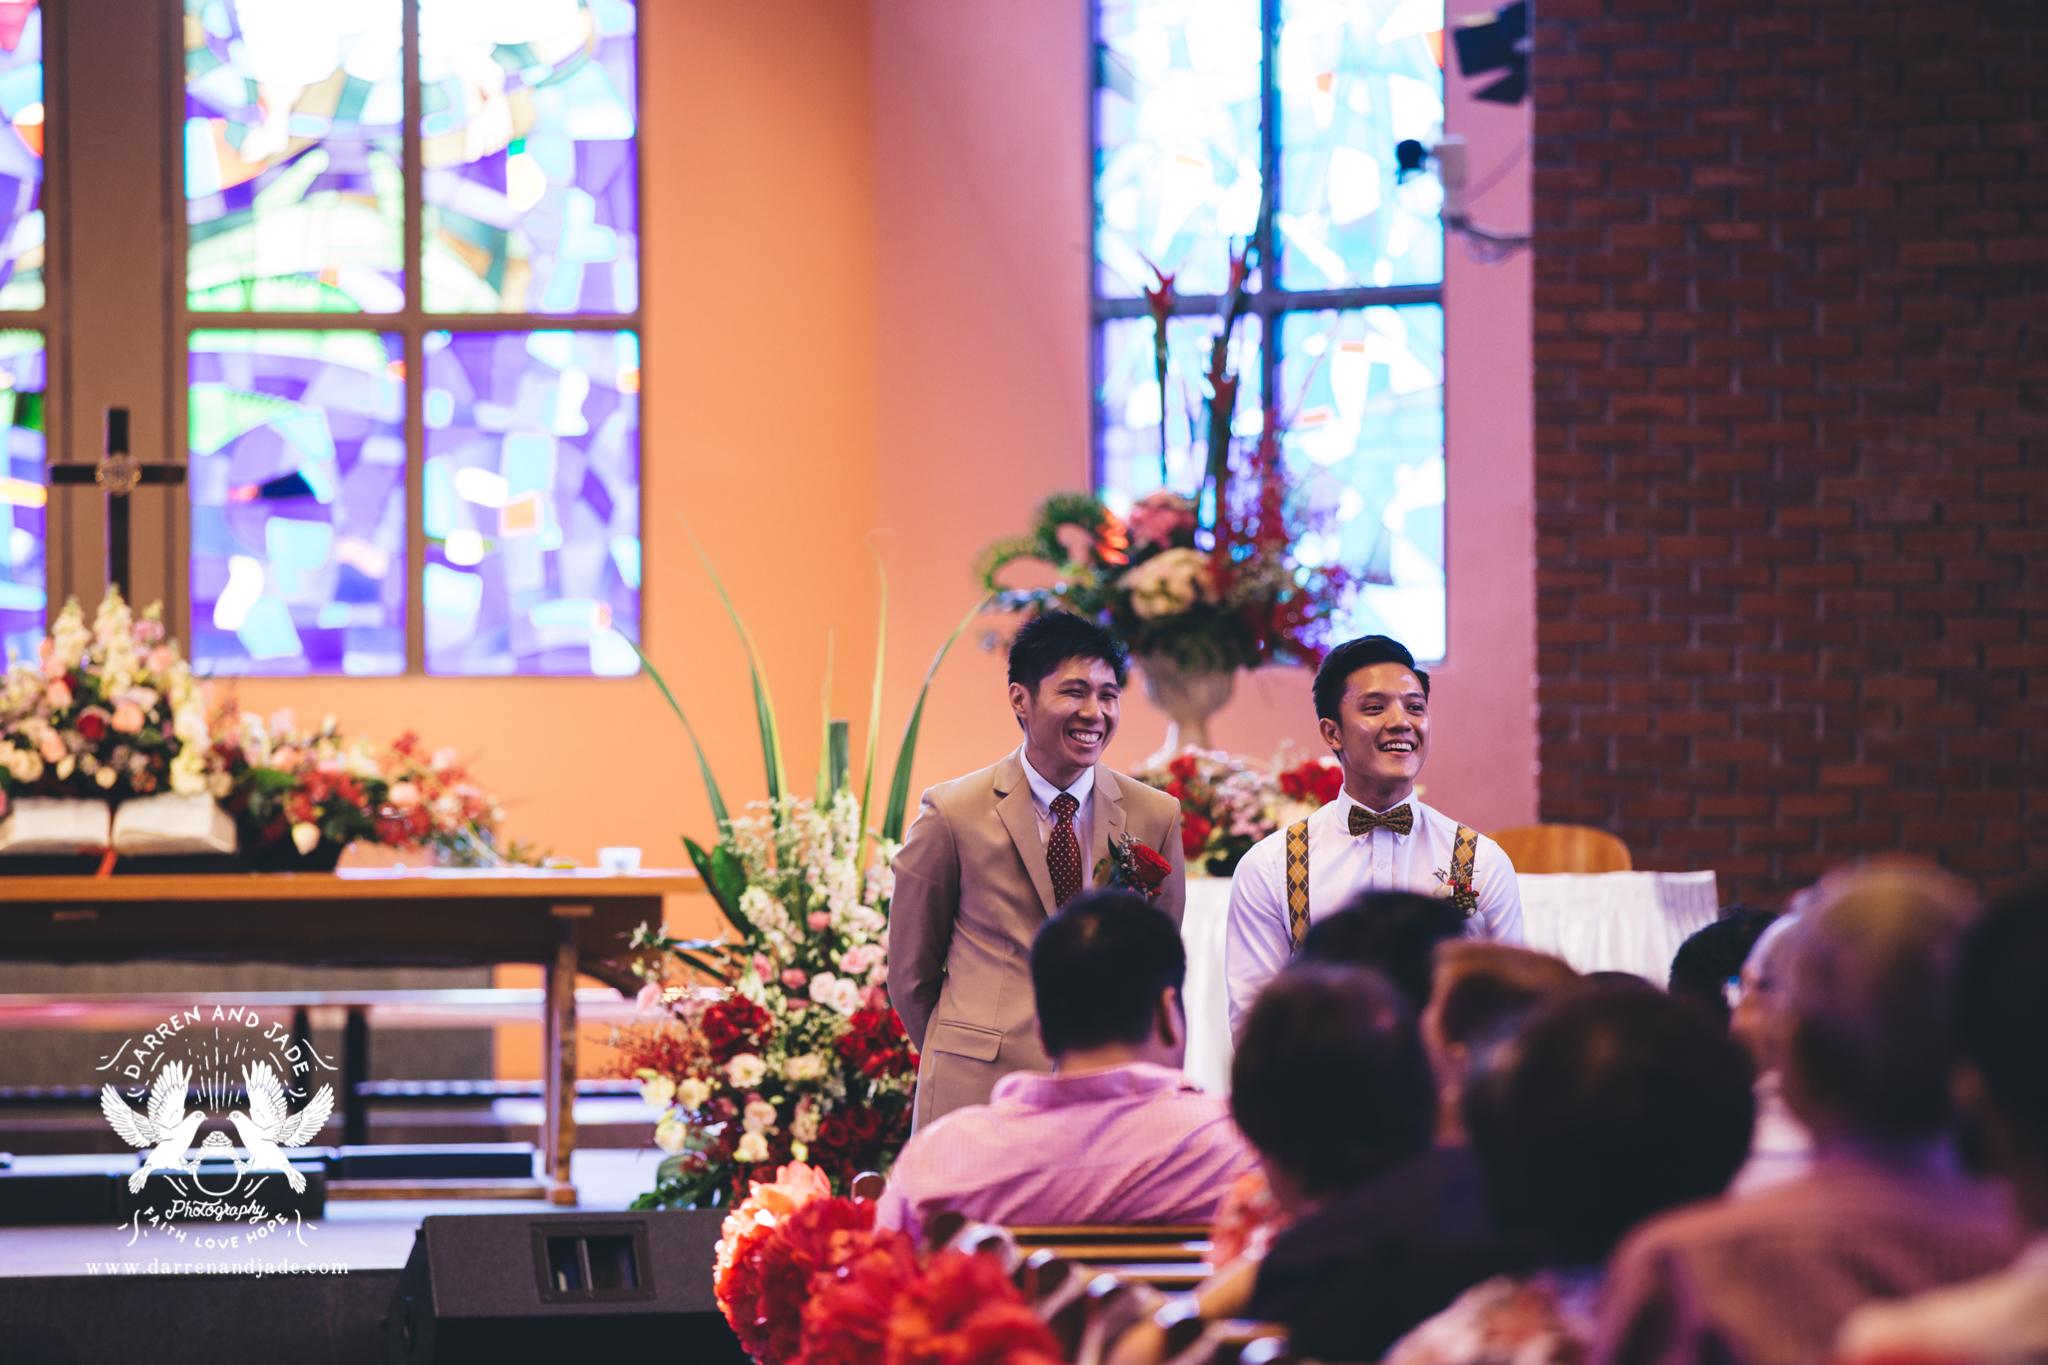 Bel & Emans - Wedding - Blog (35 of 69).jpg